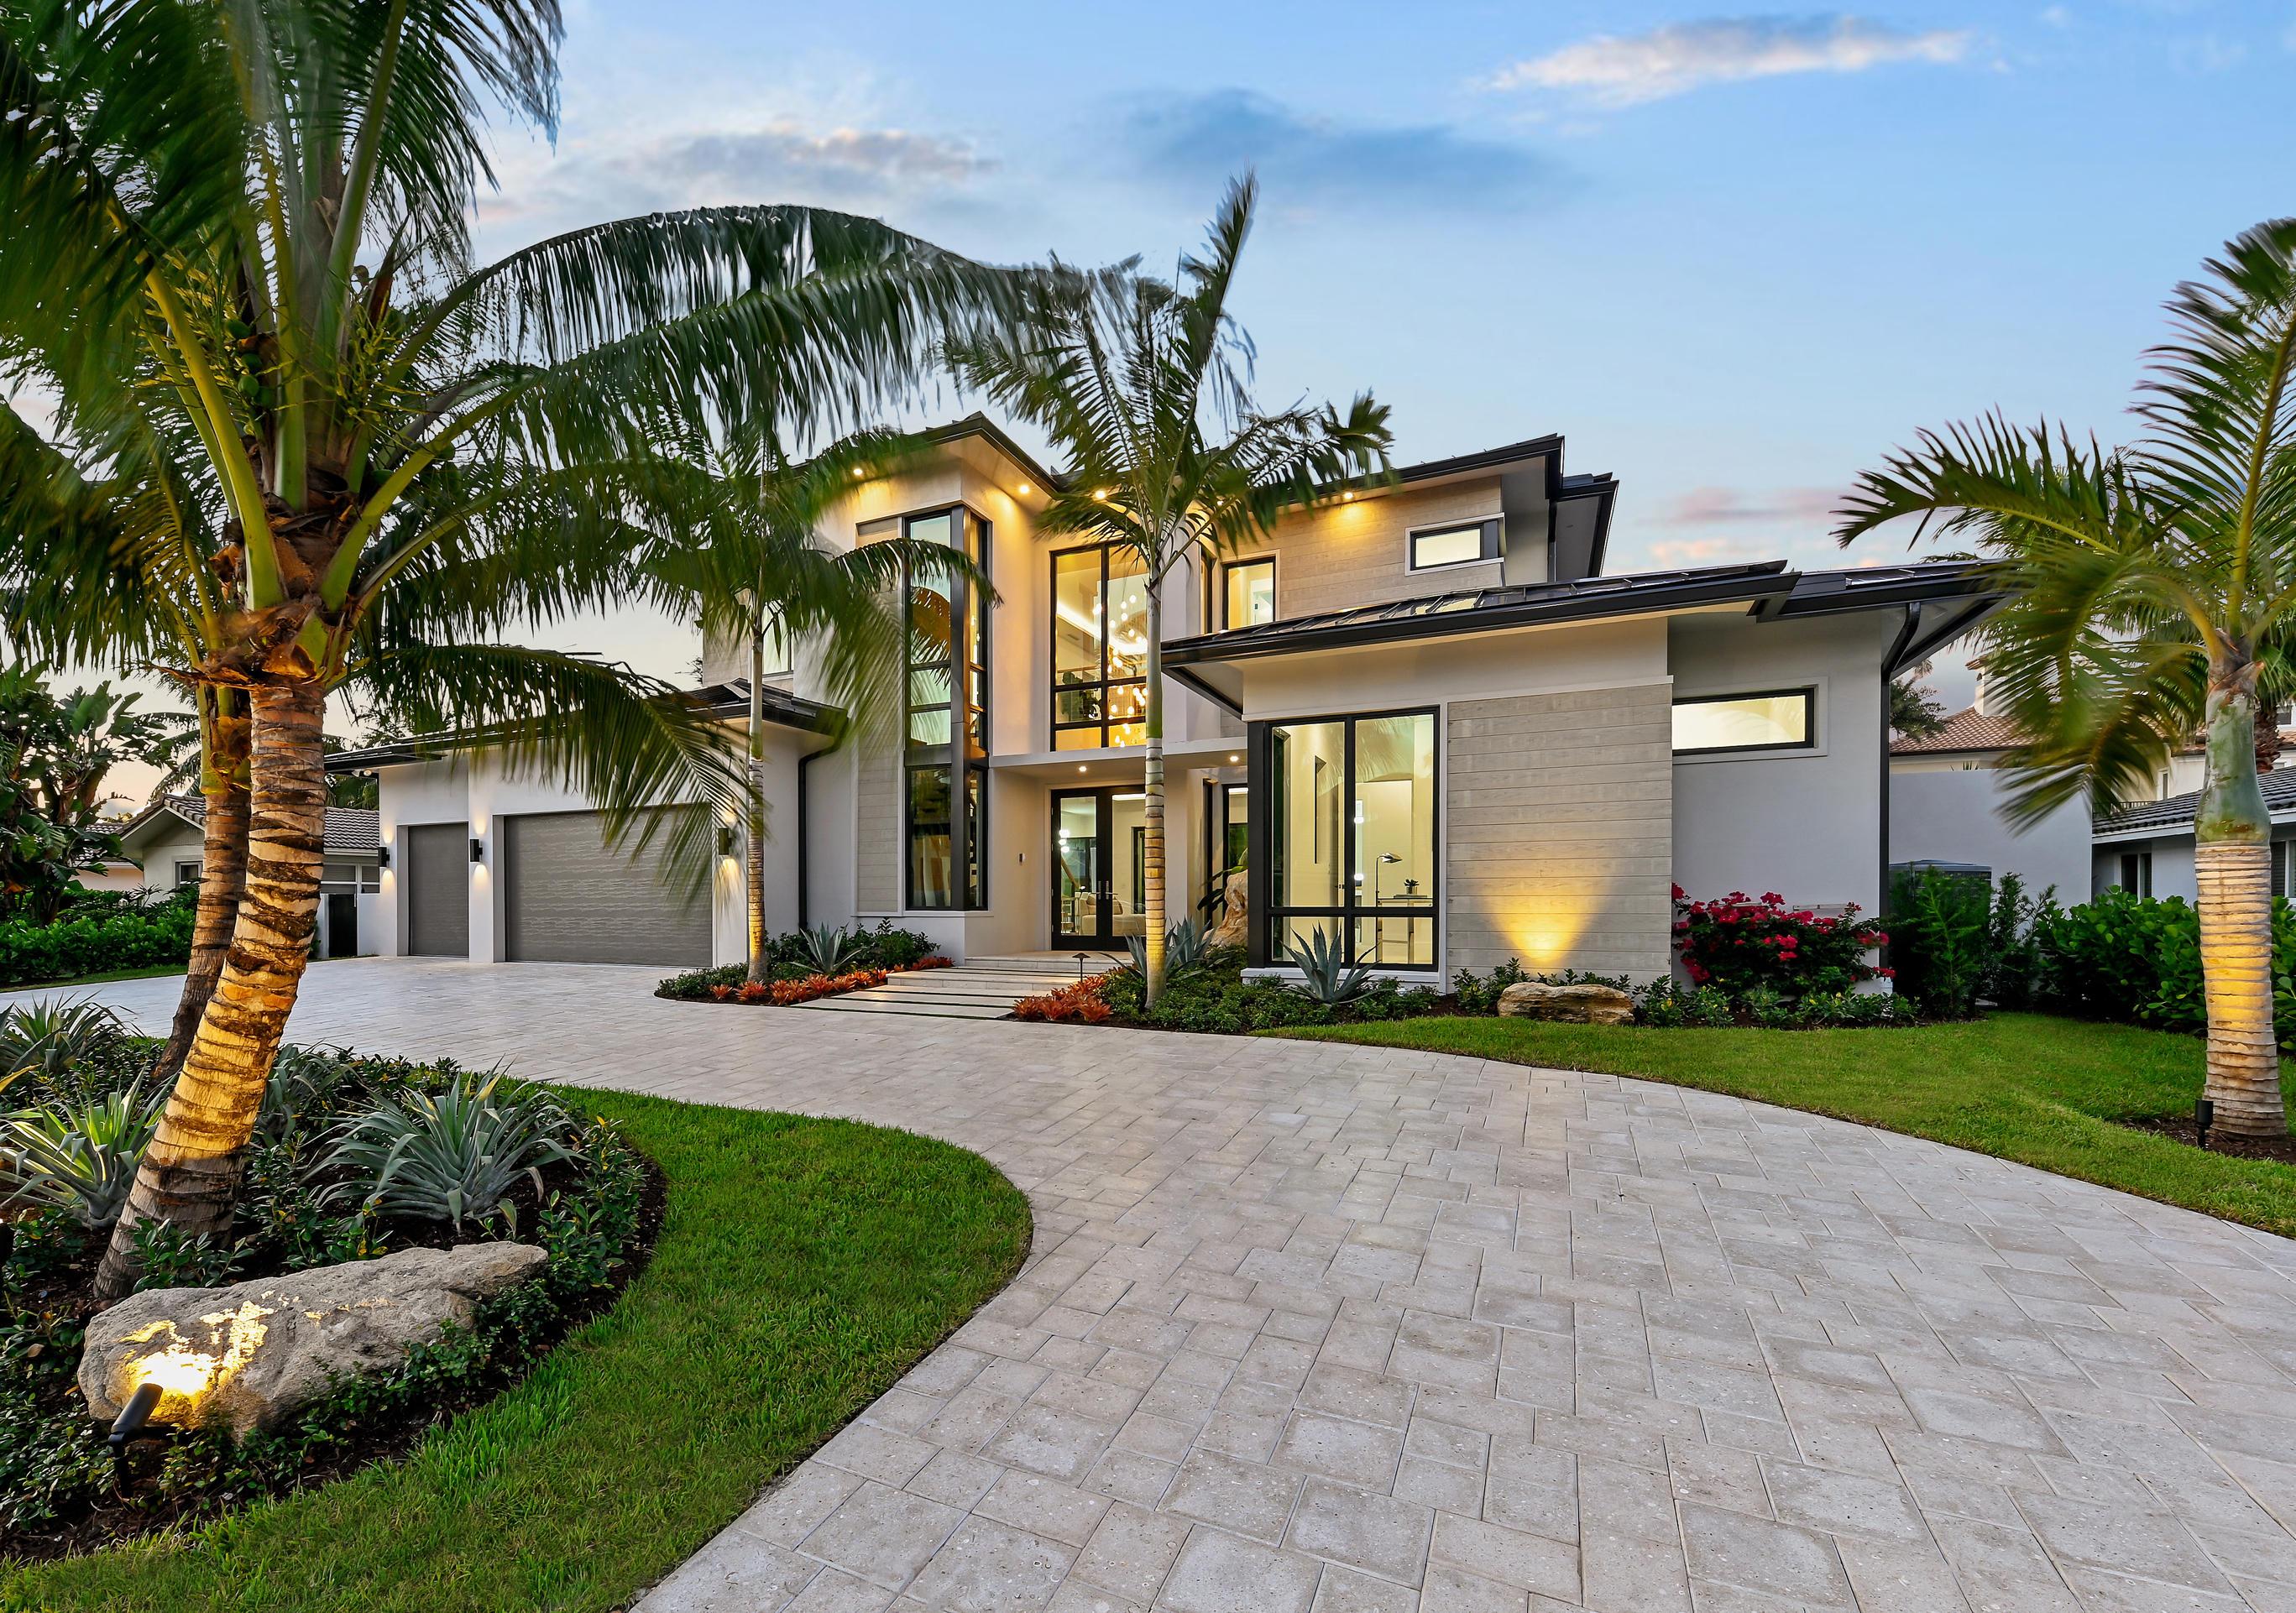 Photo of 933 Allamanda Drive, Delray Beach, FL 33483